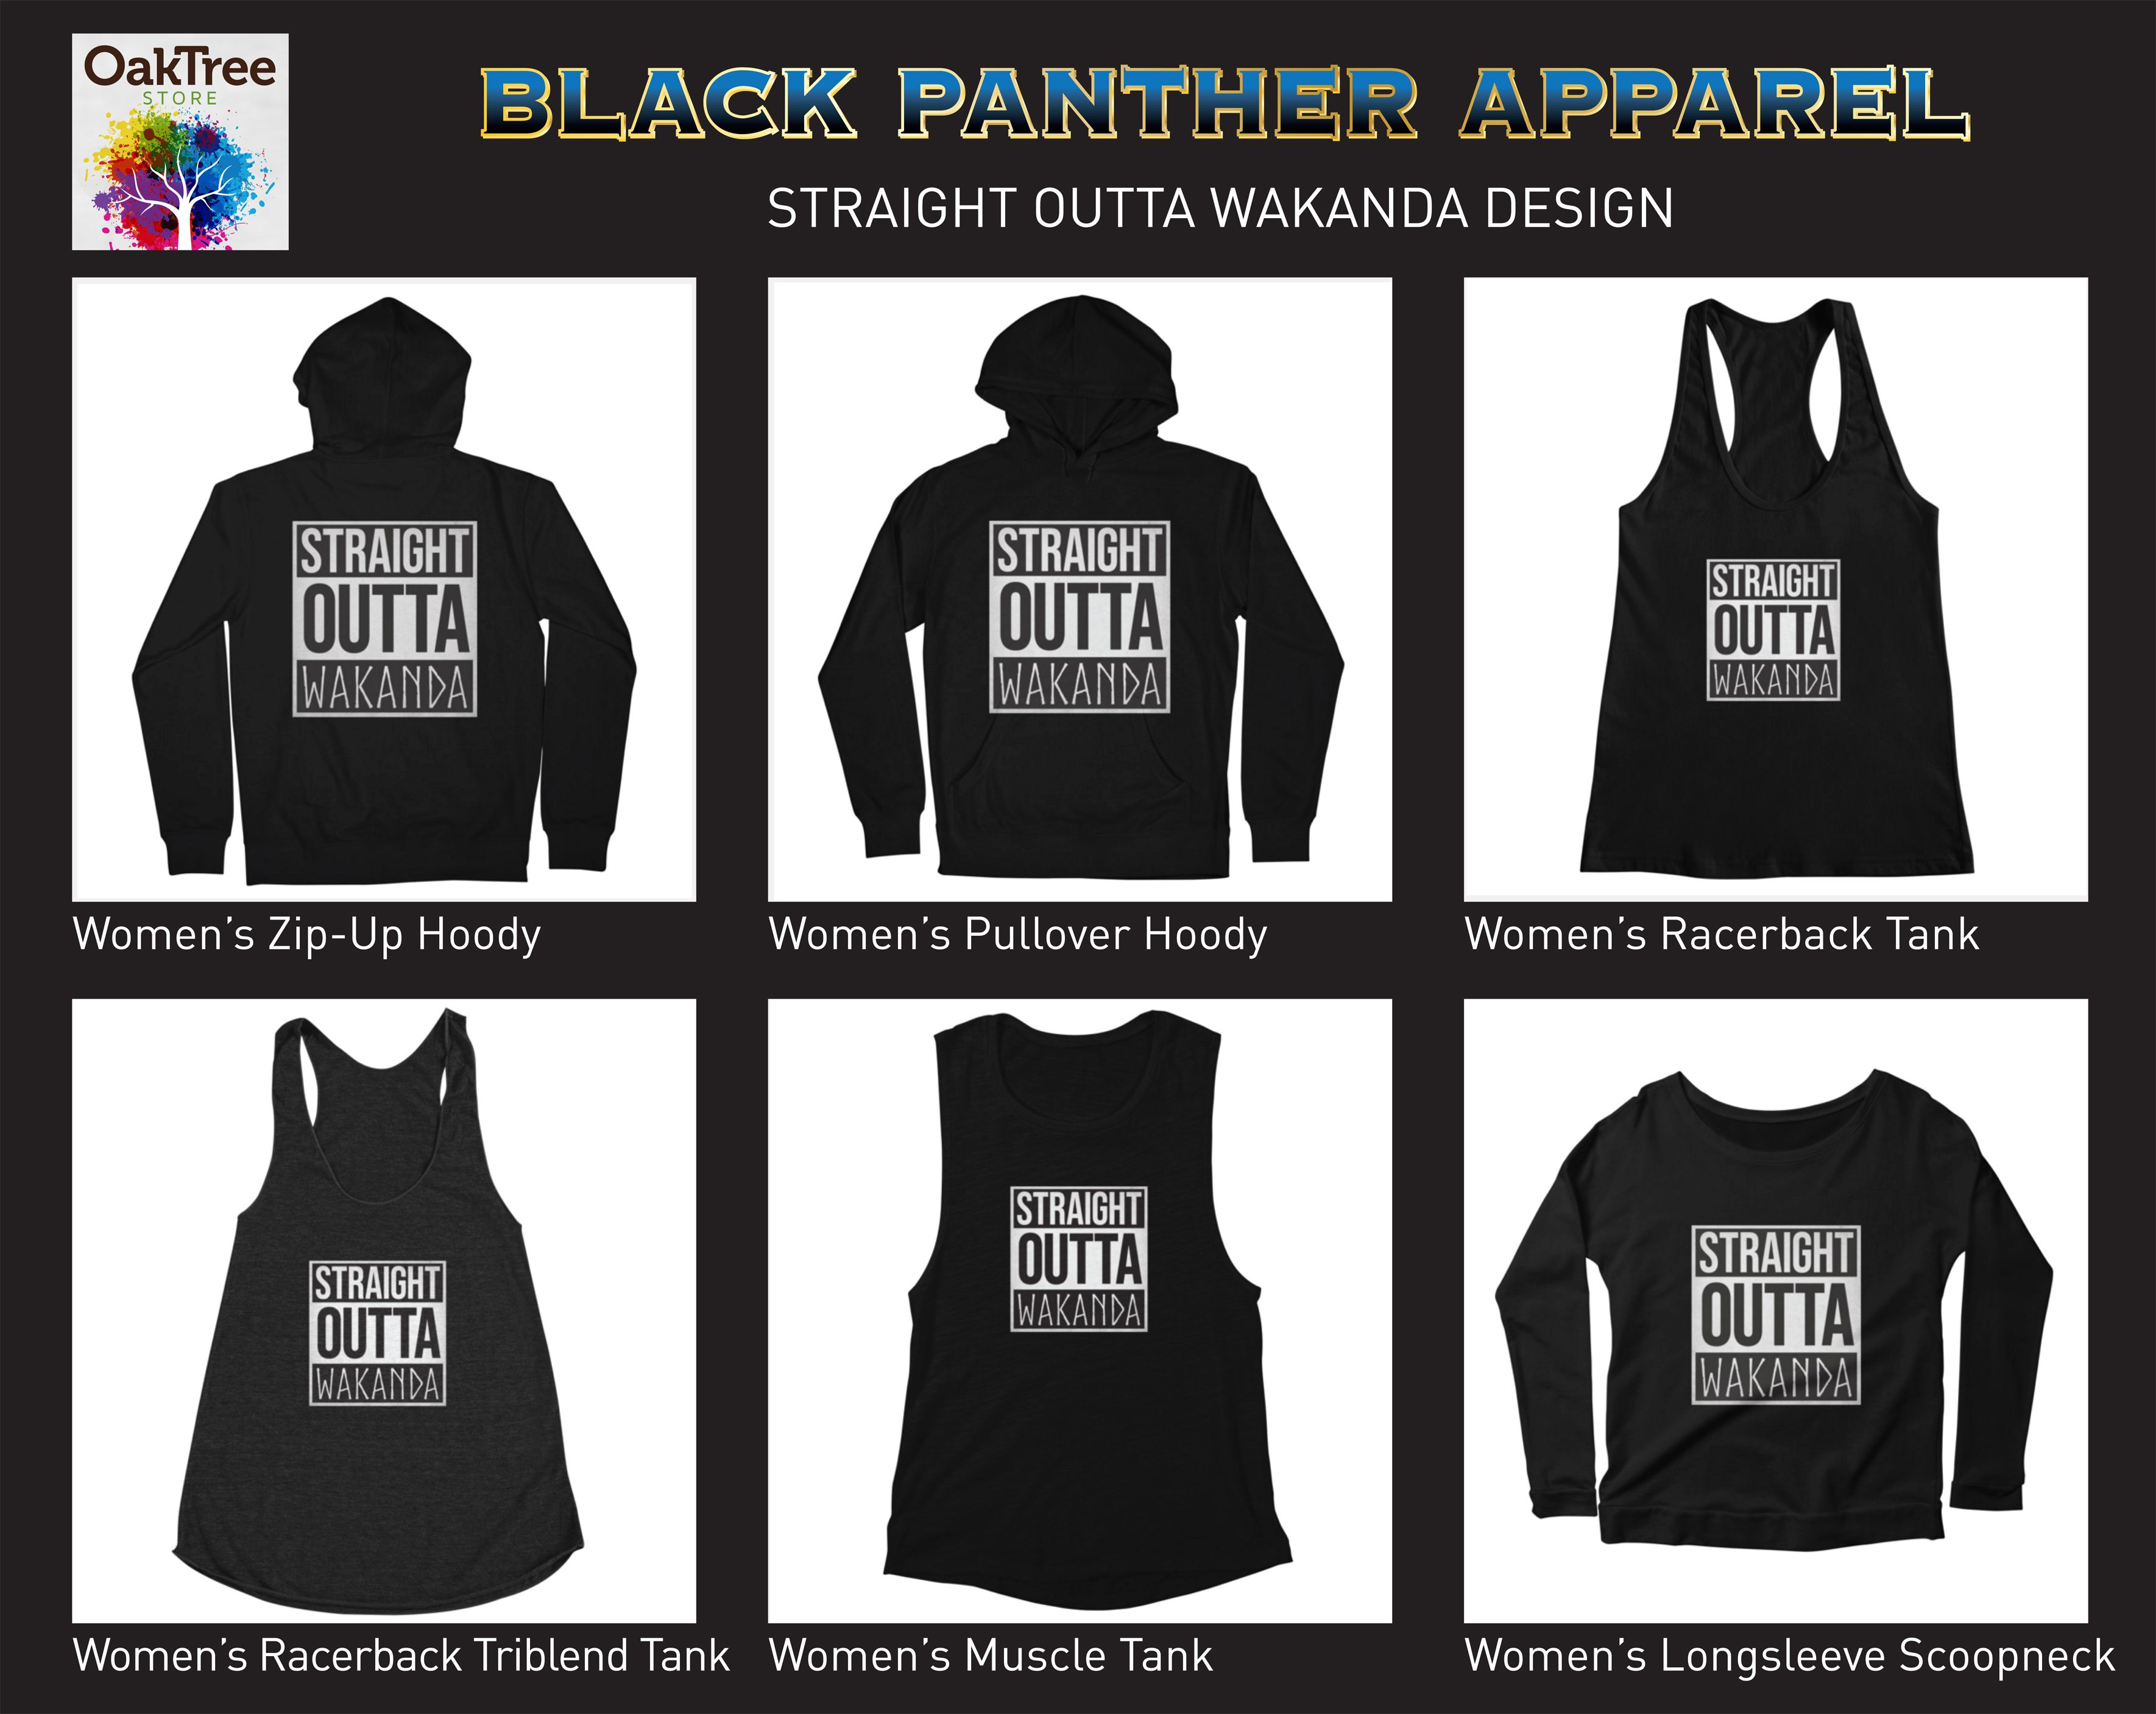 9c1843b3 Black Panther - Straight Outta Wakanda - T-shirt - Apparel ...